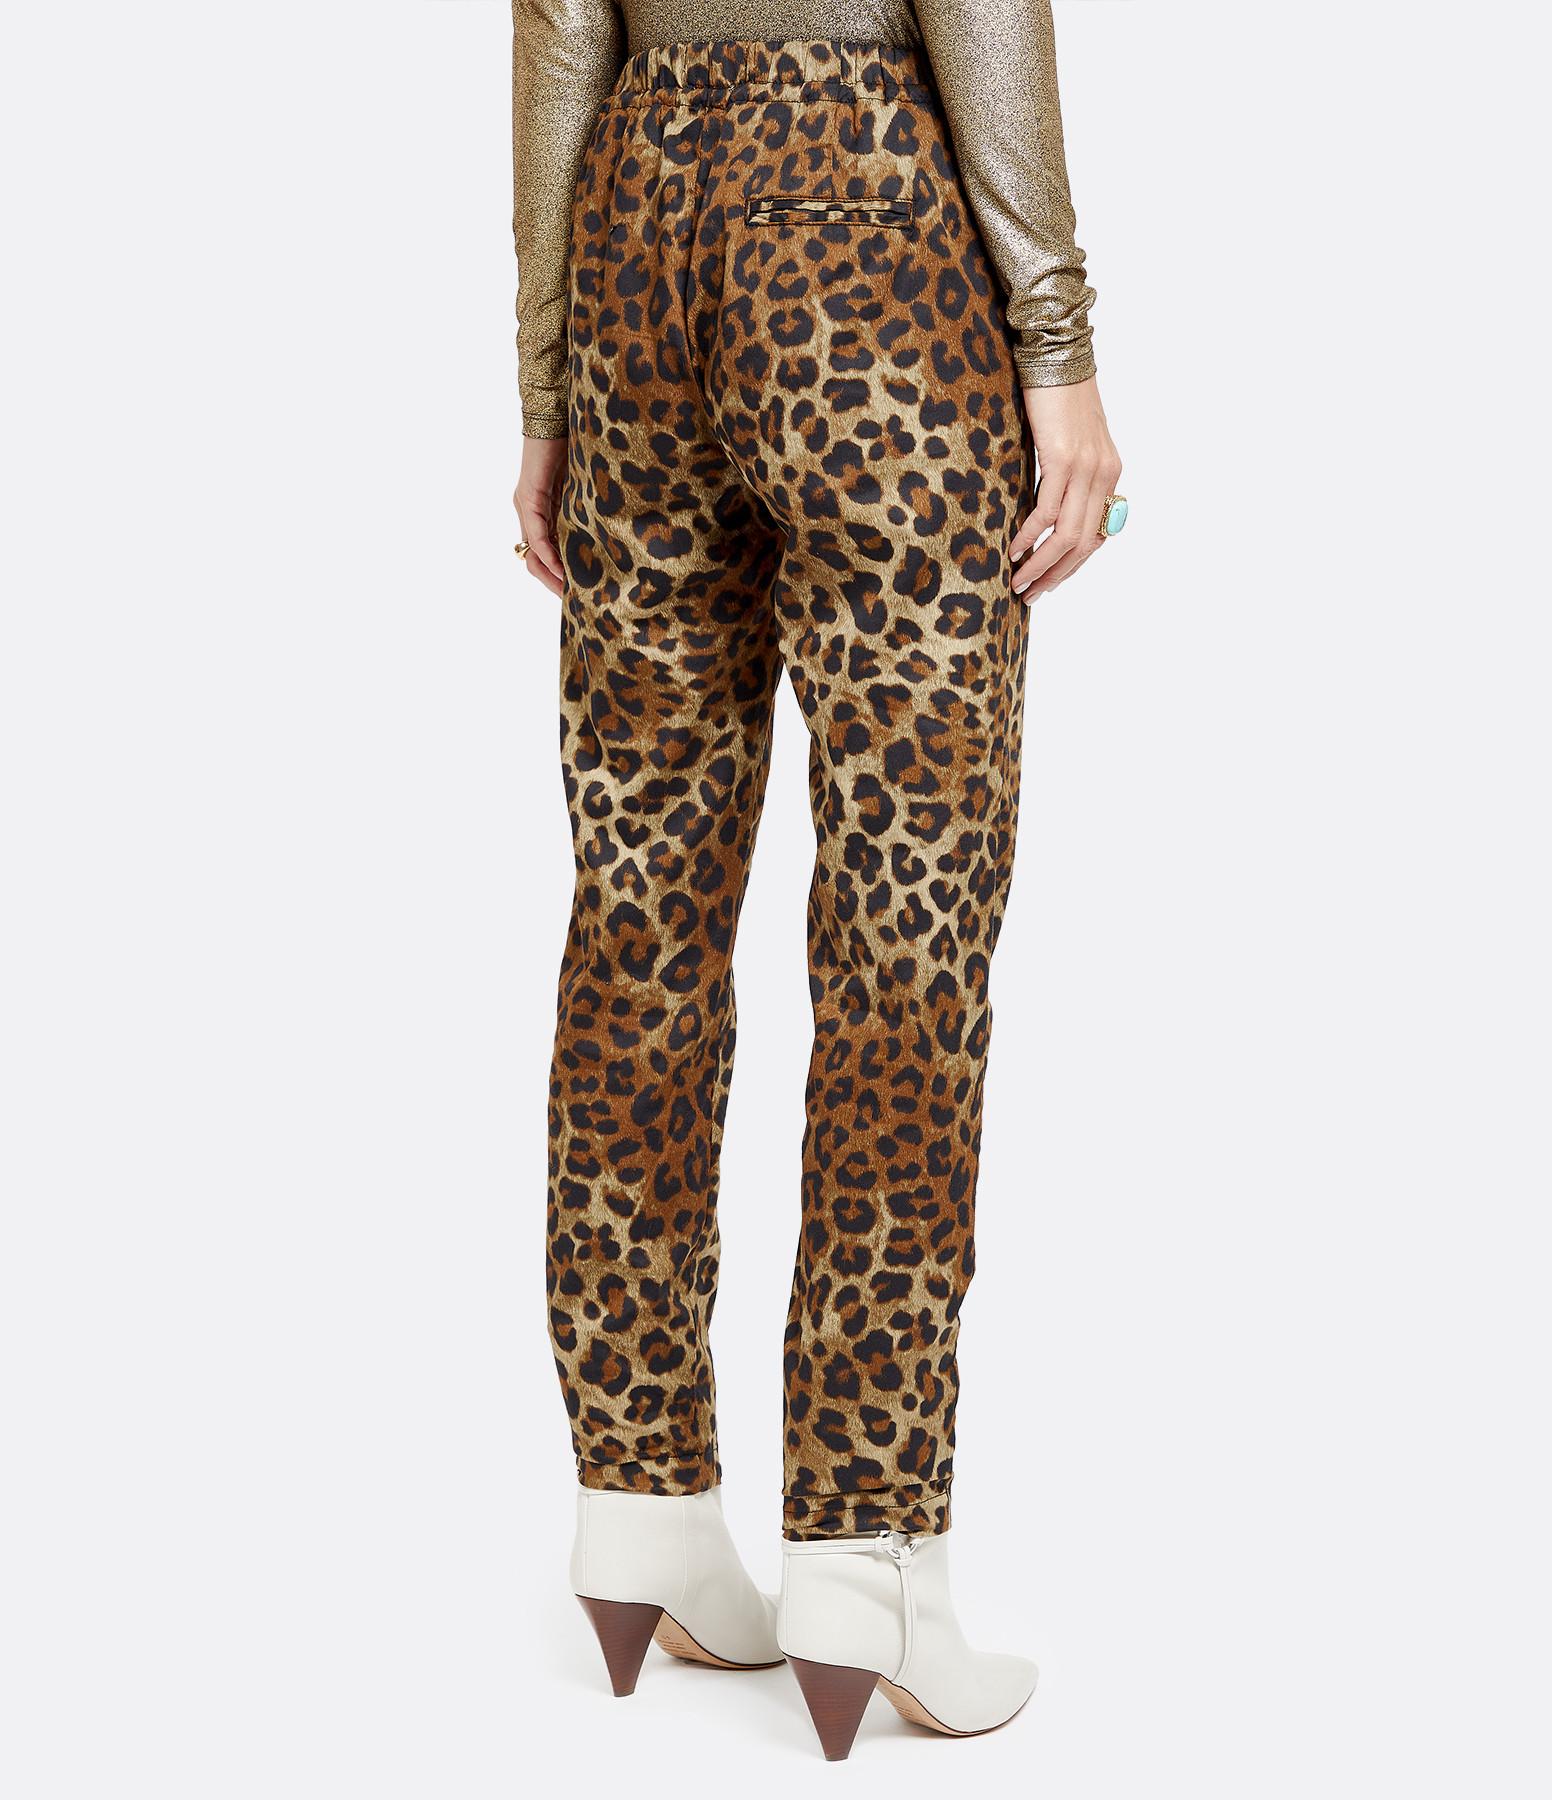 OVERLOVER - Pantalon Yucca Satin Army